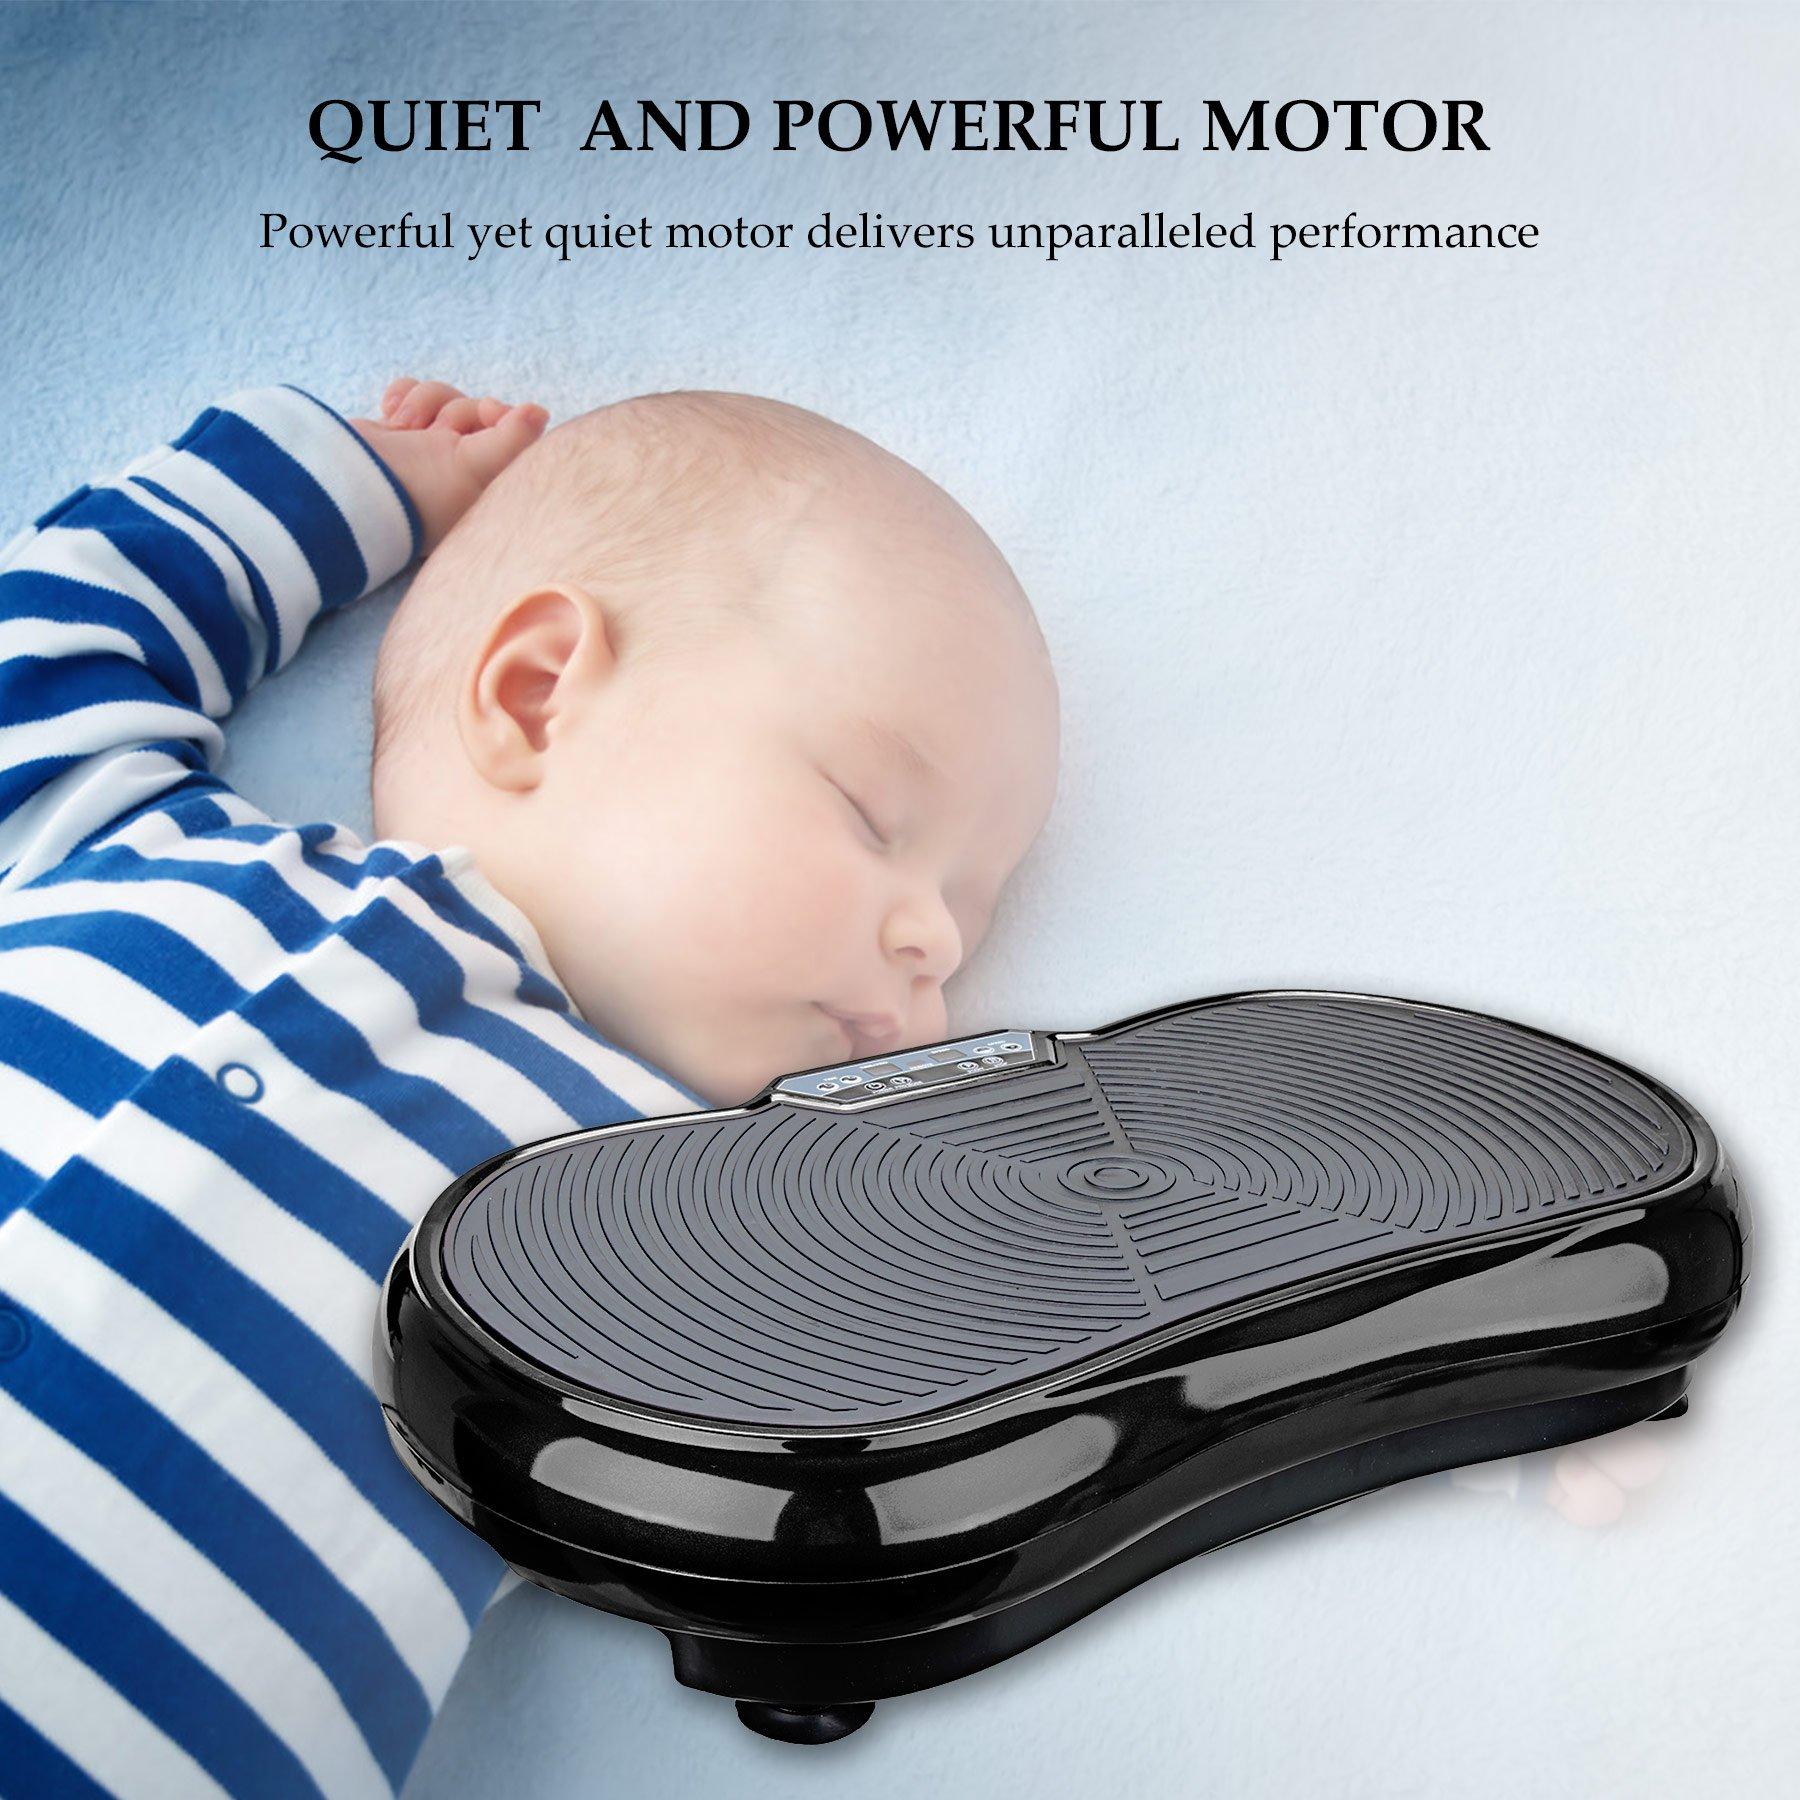 Whole Body Vibration Machine Crazy Fit Vibration Plate with Remote Control /& Resistance Bands Pinty Fitness Vibration Platform